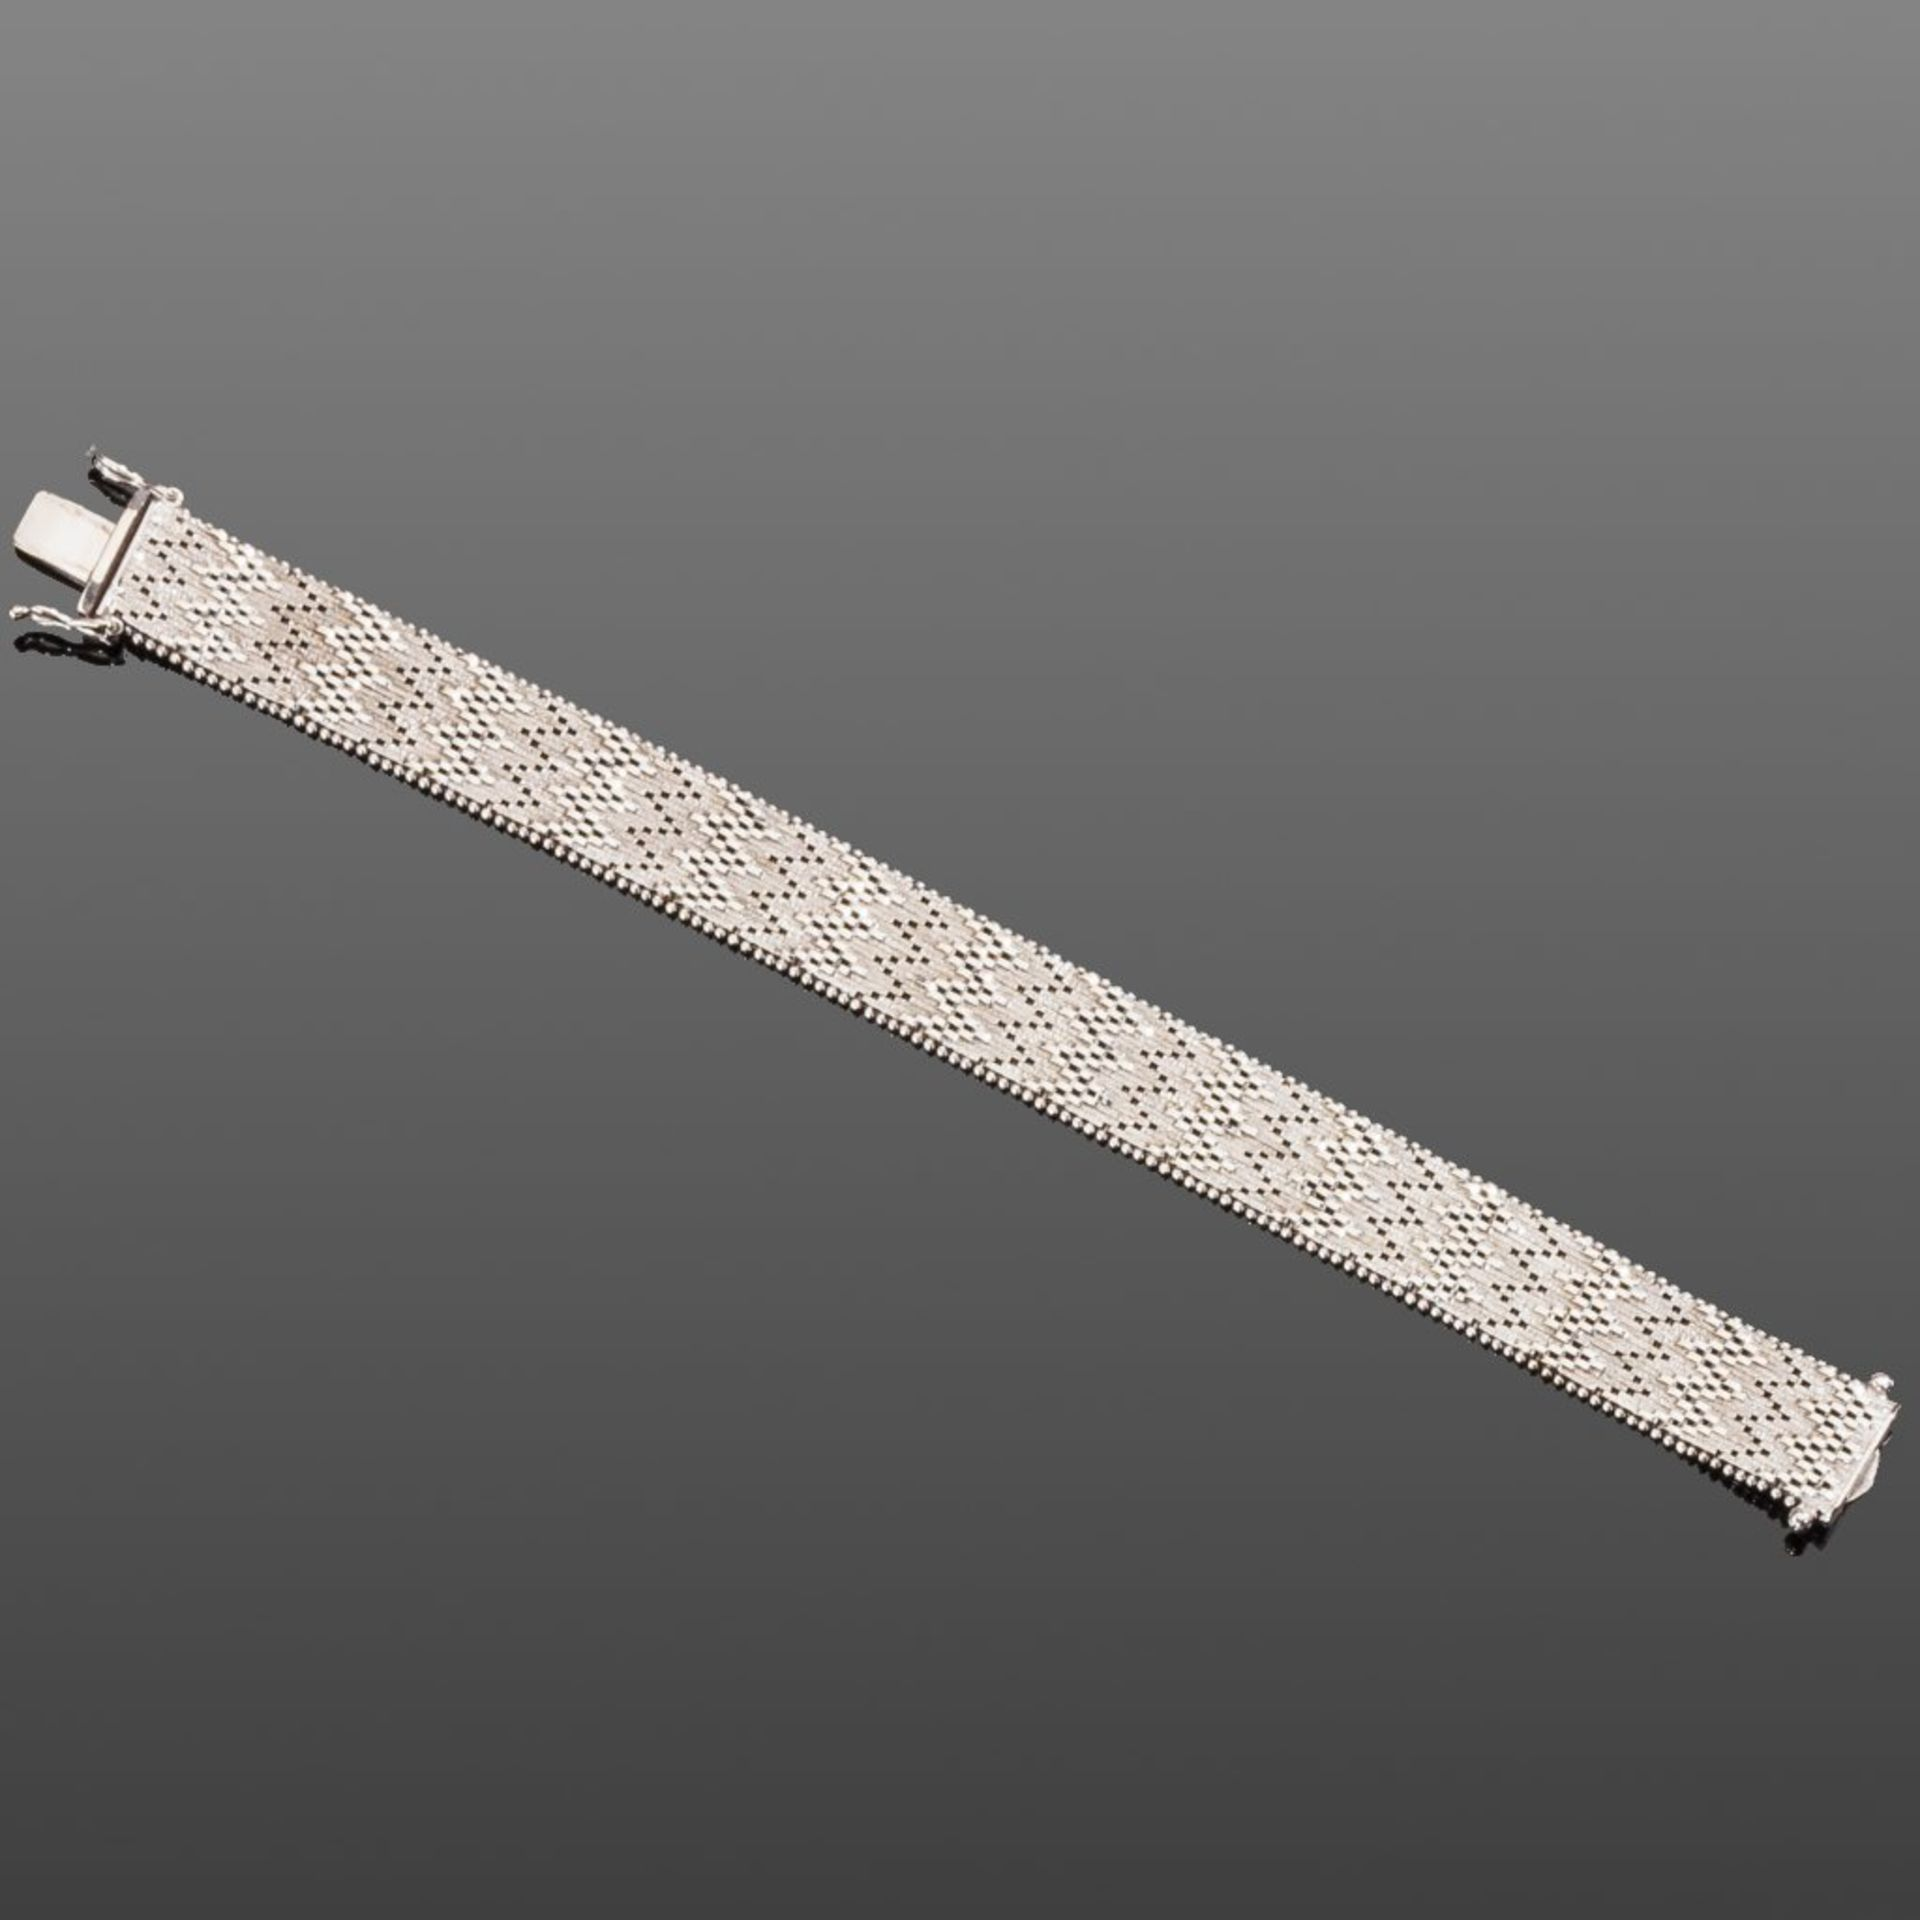 Weißgold-Armband. 14 ct. 40 g. L 17,2 cm